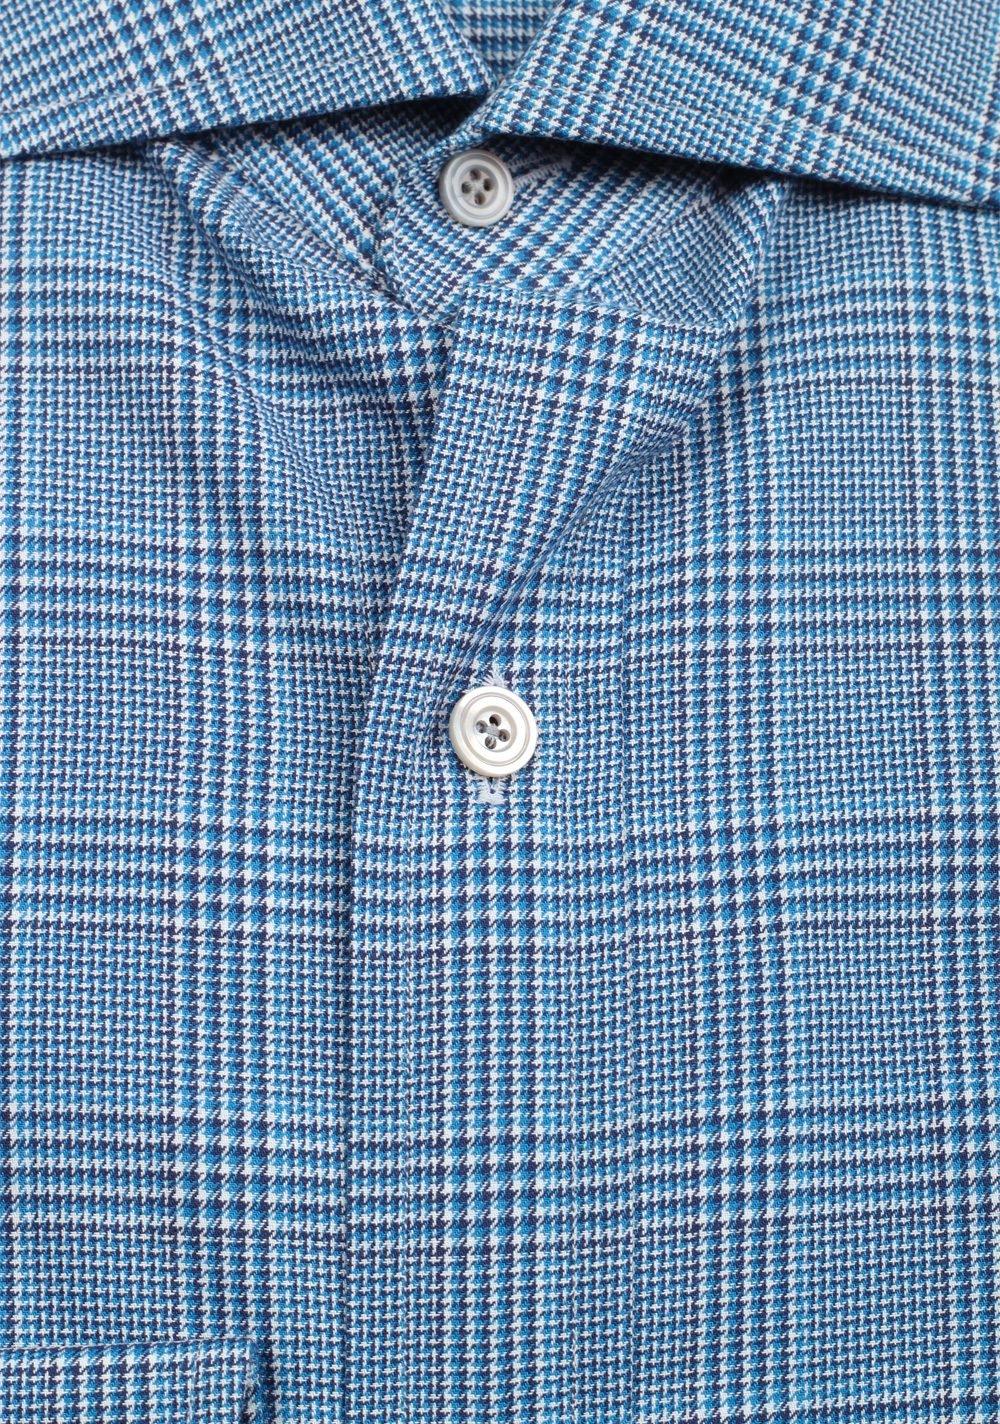 TOM FORD Checked White Blue Shirt Size 41 / 16 U.S. | Costume Limité